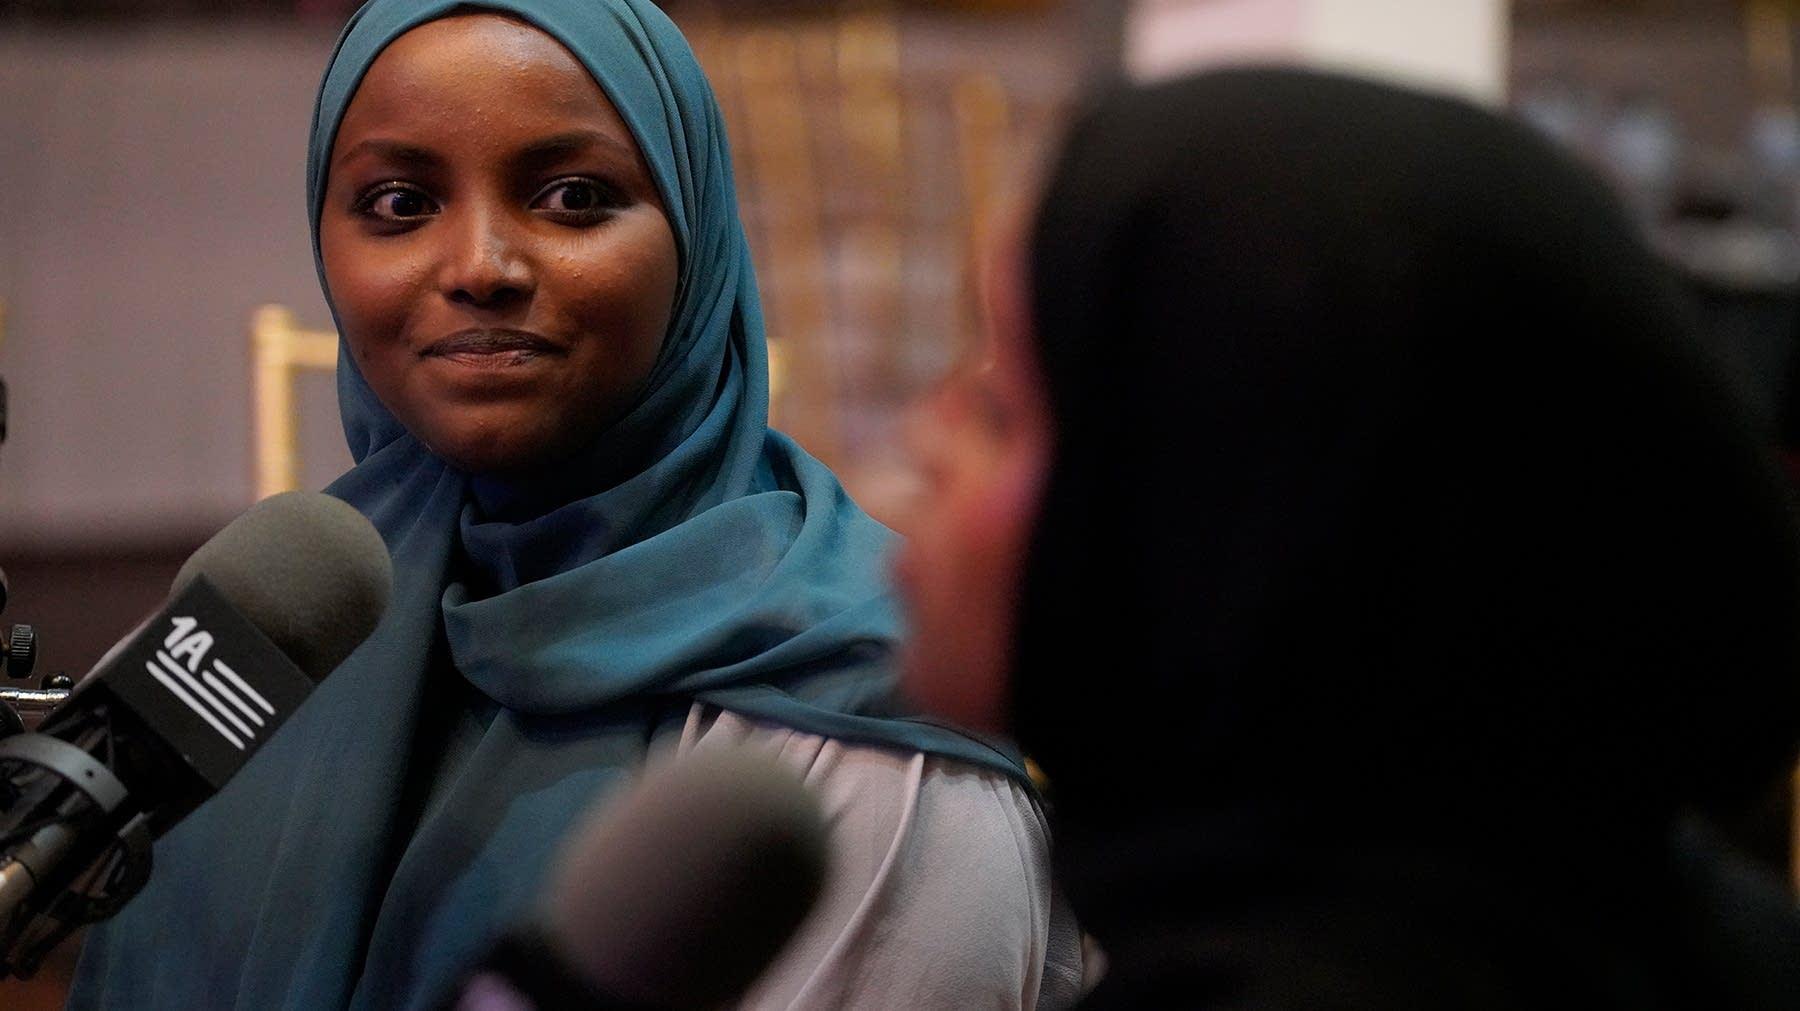 Nadia Mohamed made history Tuesday night, Nov. 5, 2019, by becoming first Somali elected to St. Louis Park City Council. Dymanh Chhoun | Sahan Journal